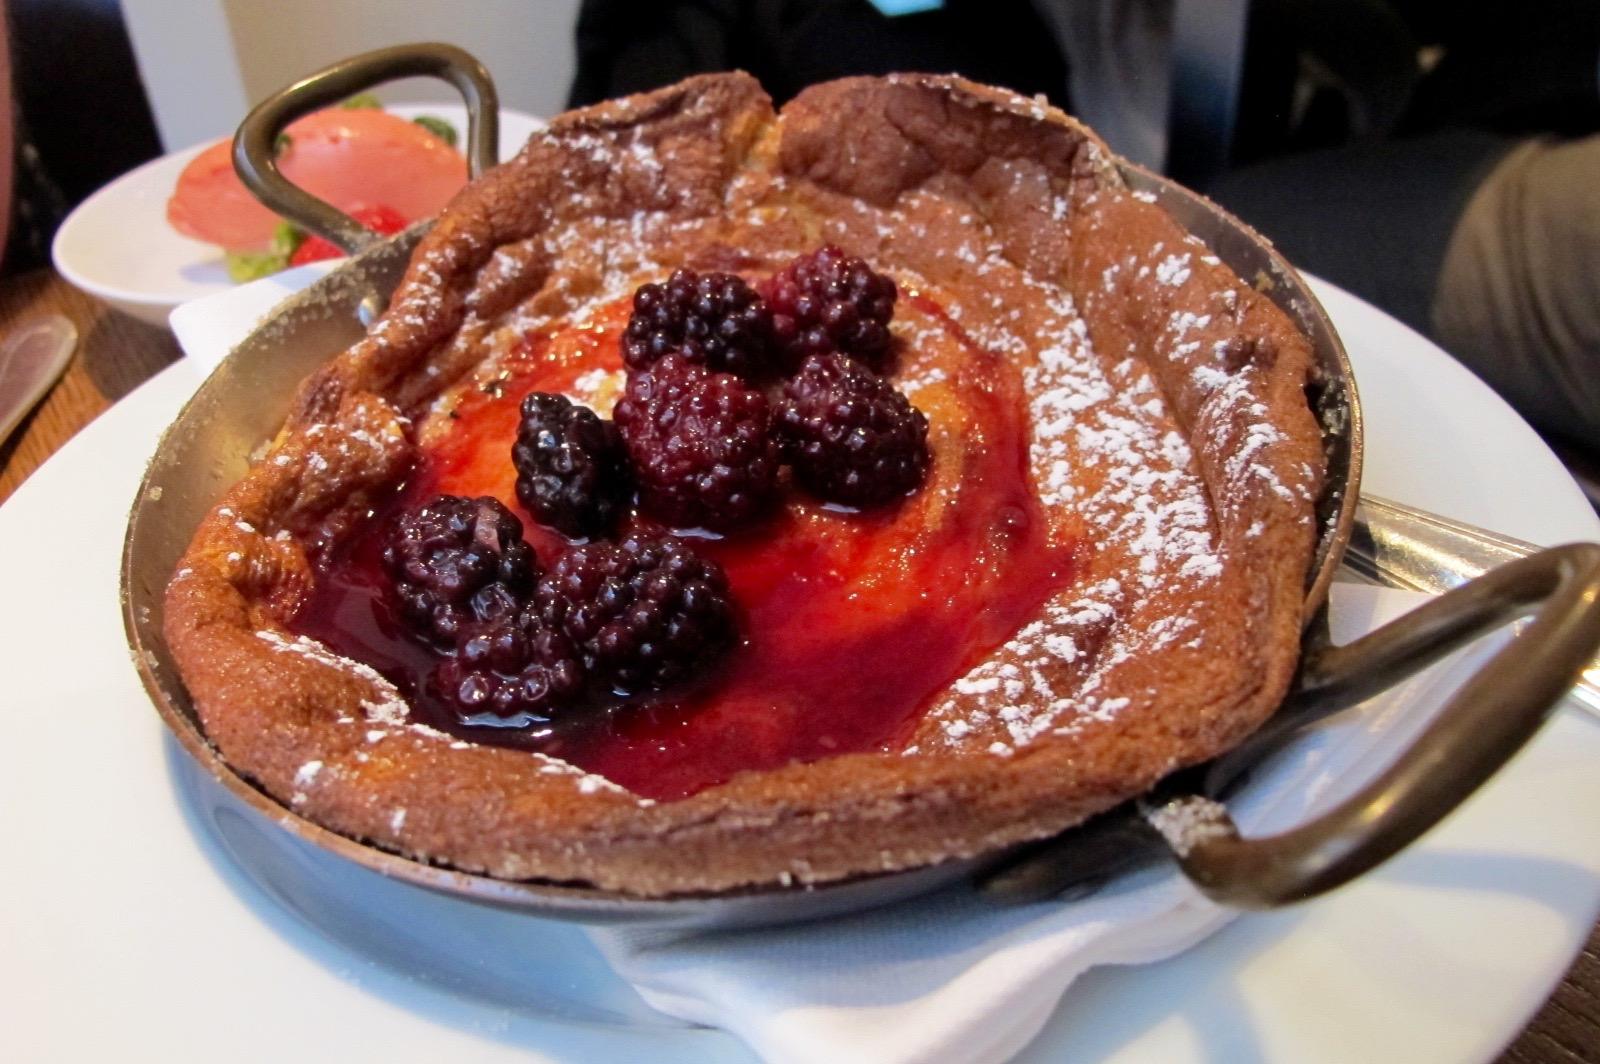 Berry clafoutis at Spring restaurant in Paris